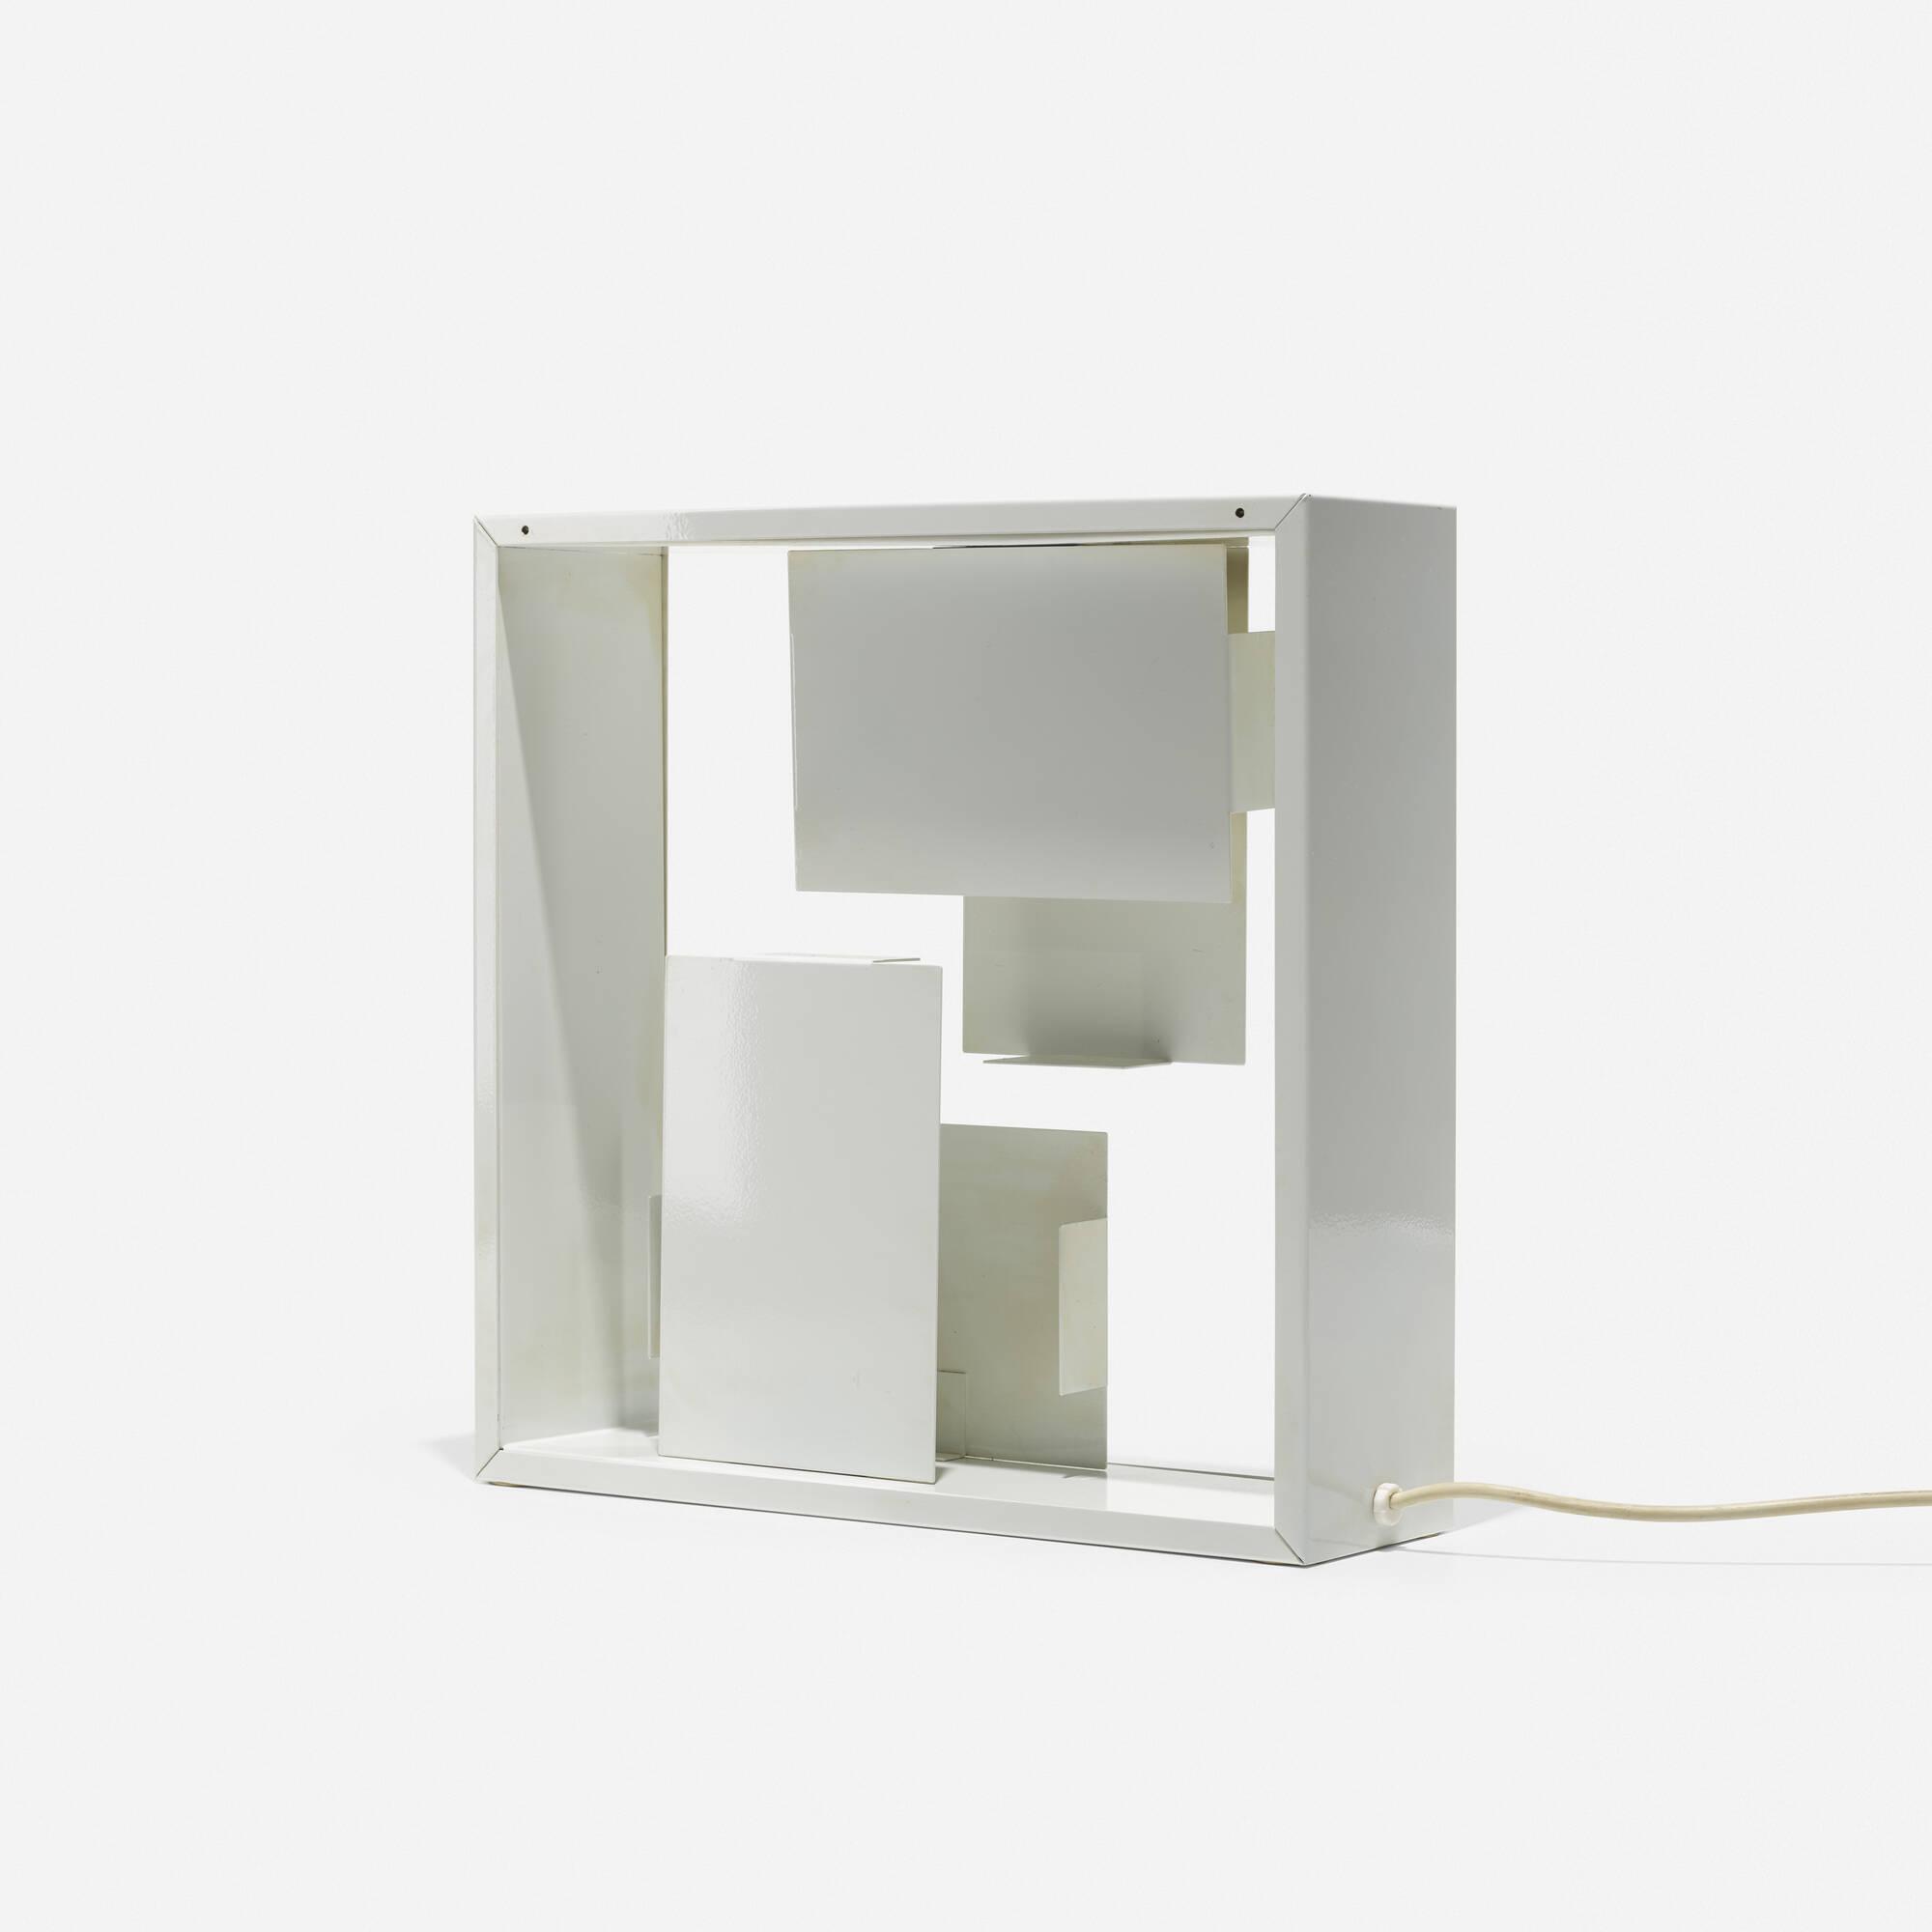 477: Gio Ponti / Fato table lamp (1 of 3)